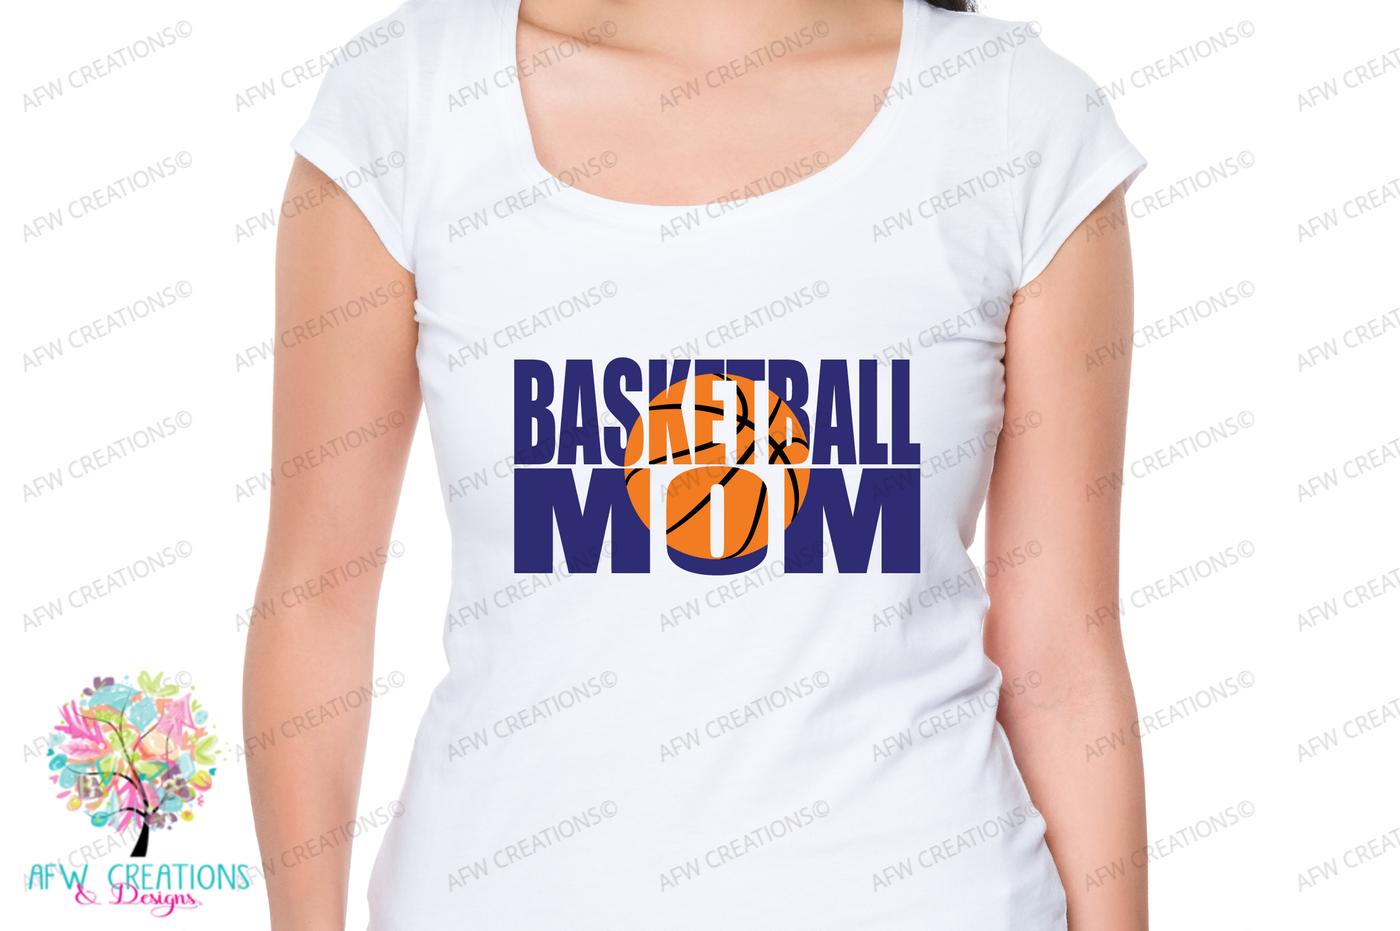 Basketball Mom Svg Dxf Eps Cut File By Afw Designs Thehungryjpeg Com